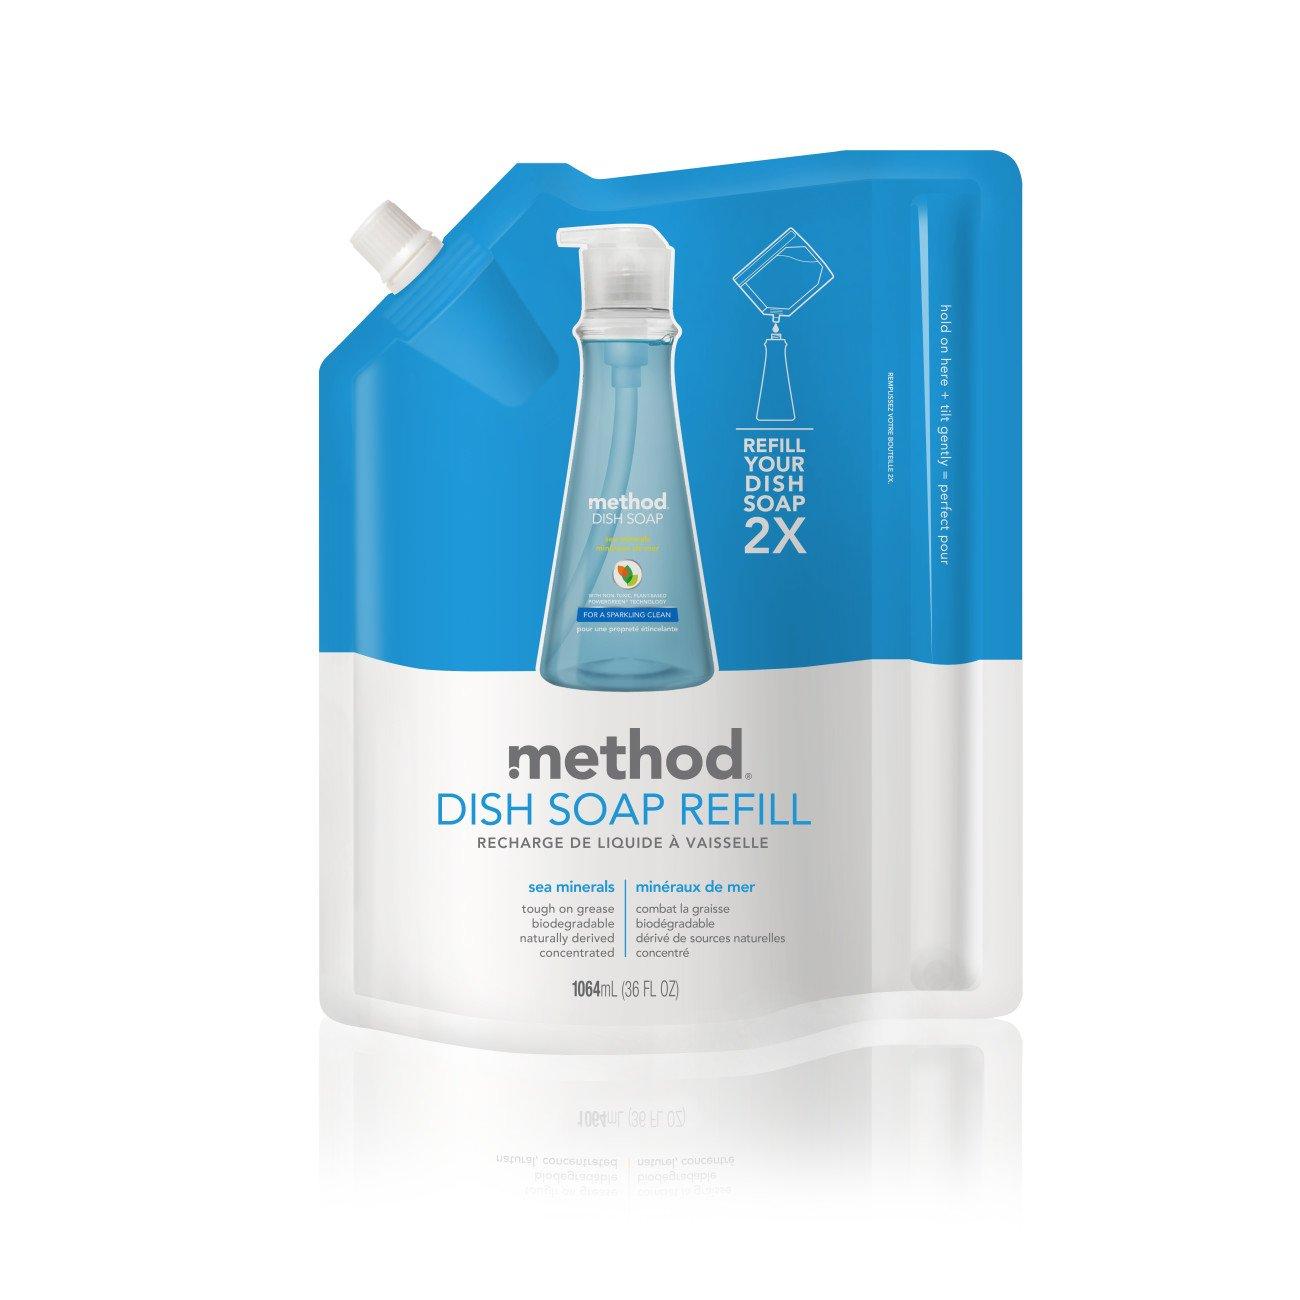 Method Dish Soap Refill, Sea Minerals, 36 Fl Oz, Pack of 6